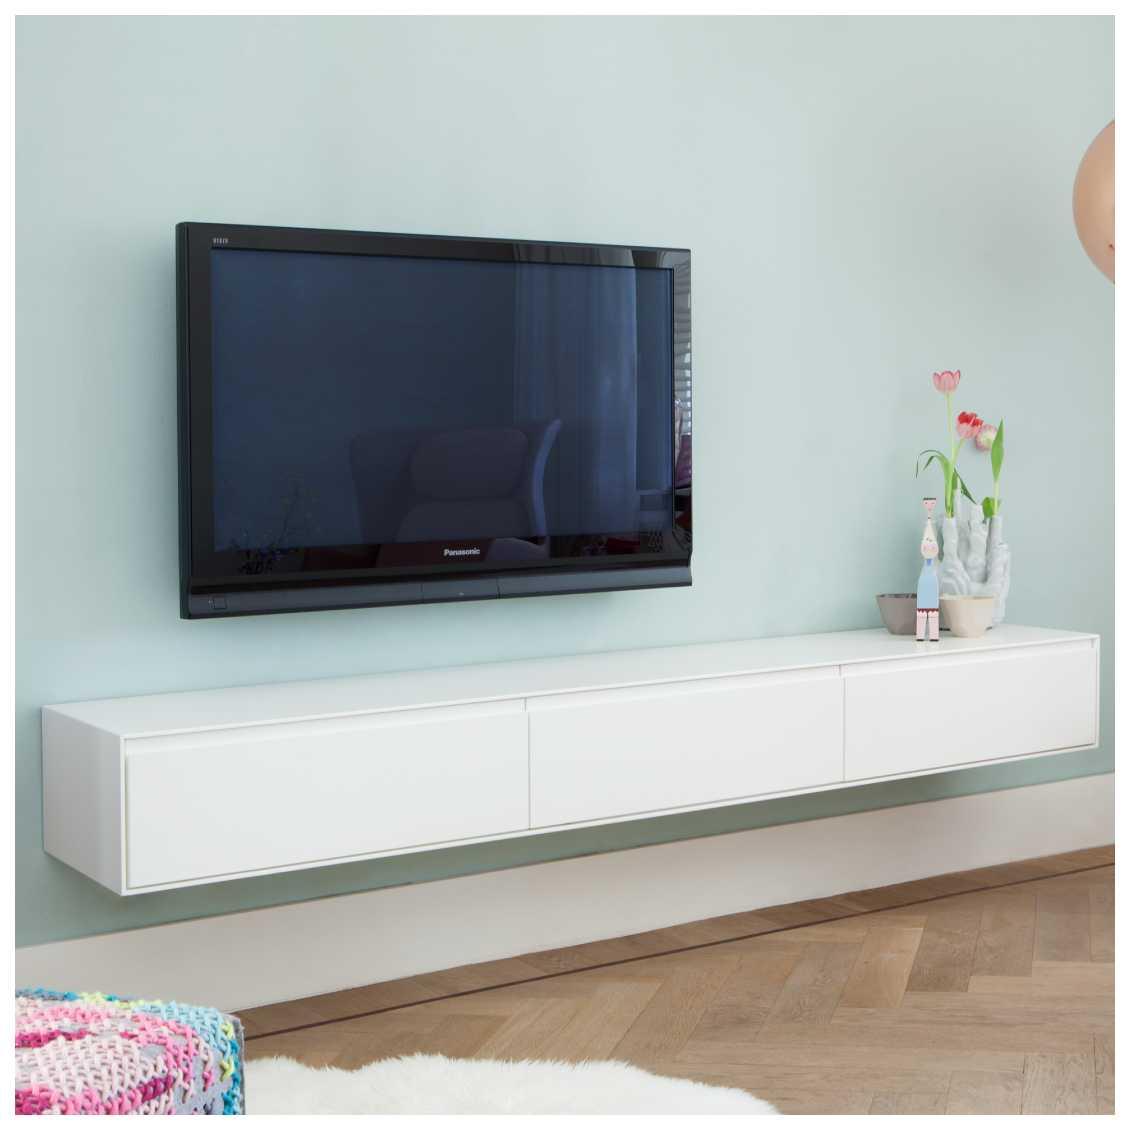 Ruijch The Box zwevende TV meubel